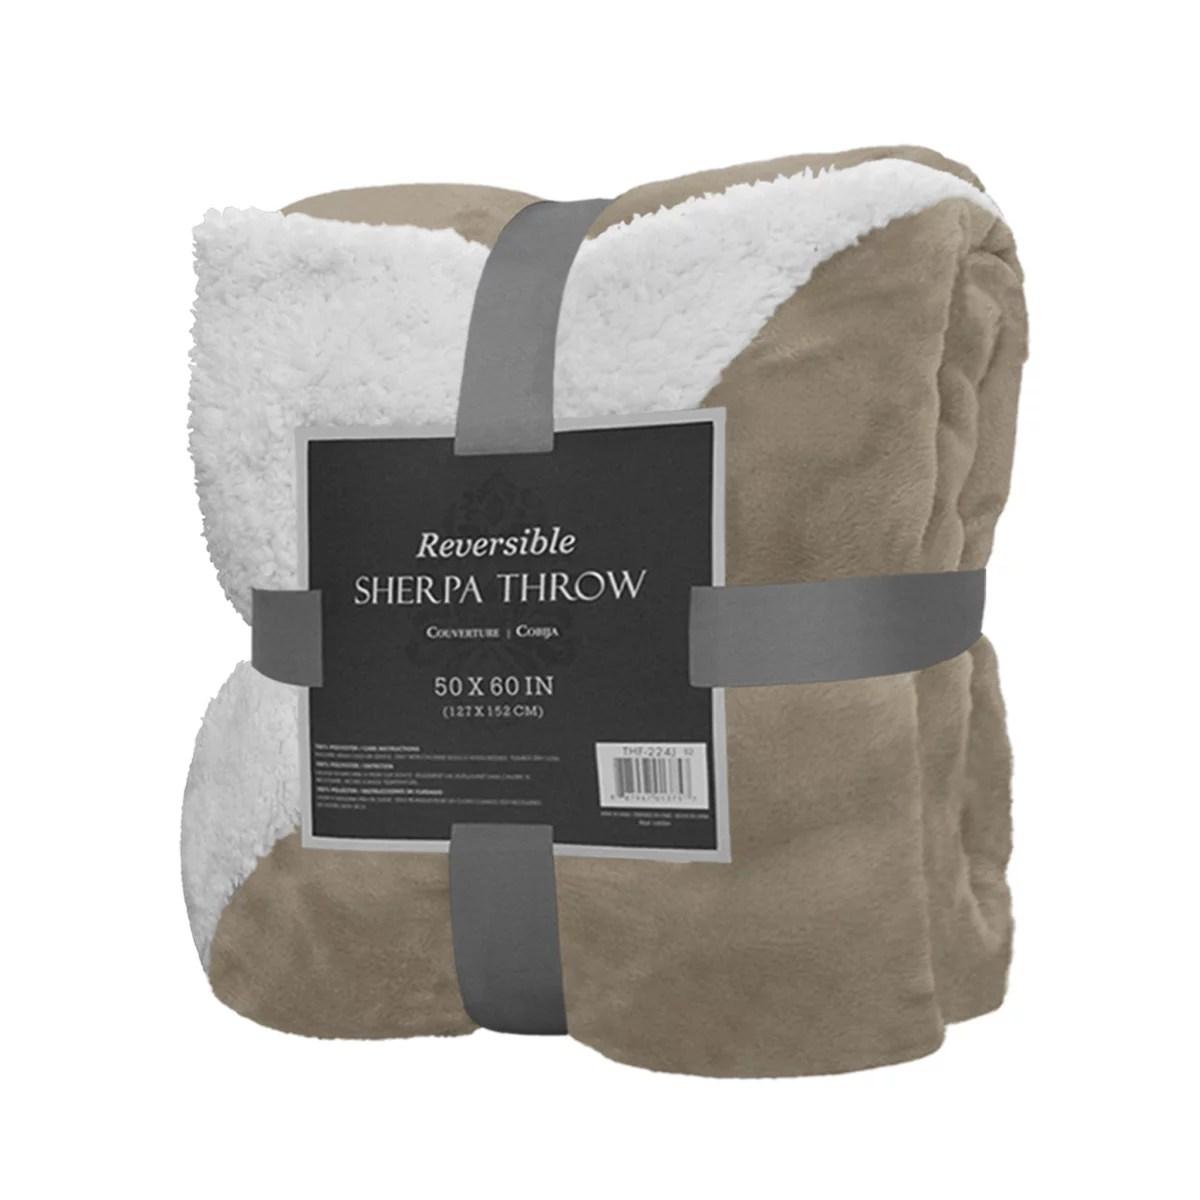 reversible sherpa throw blanket